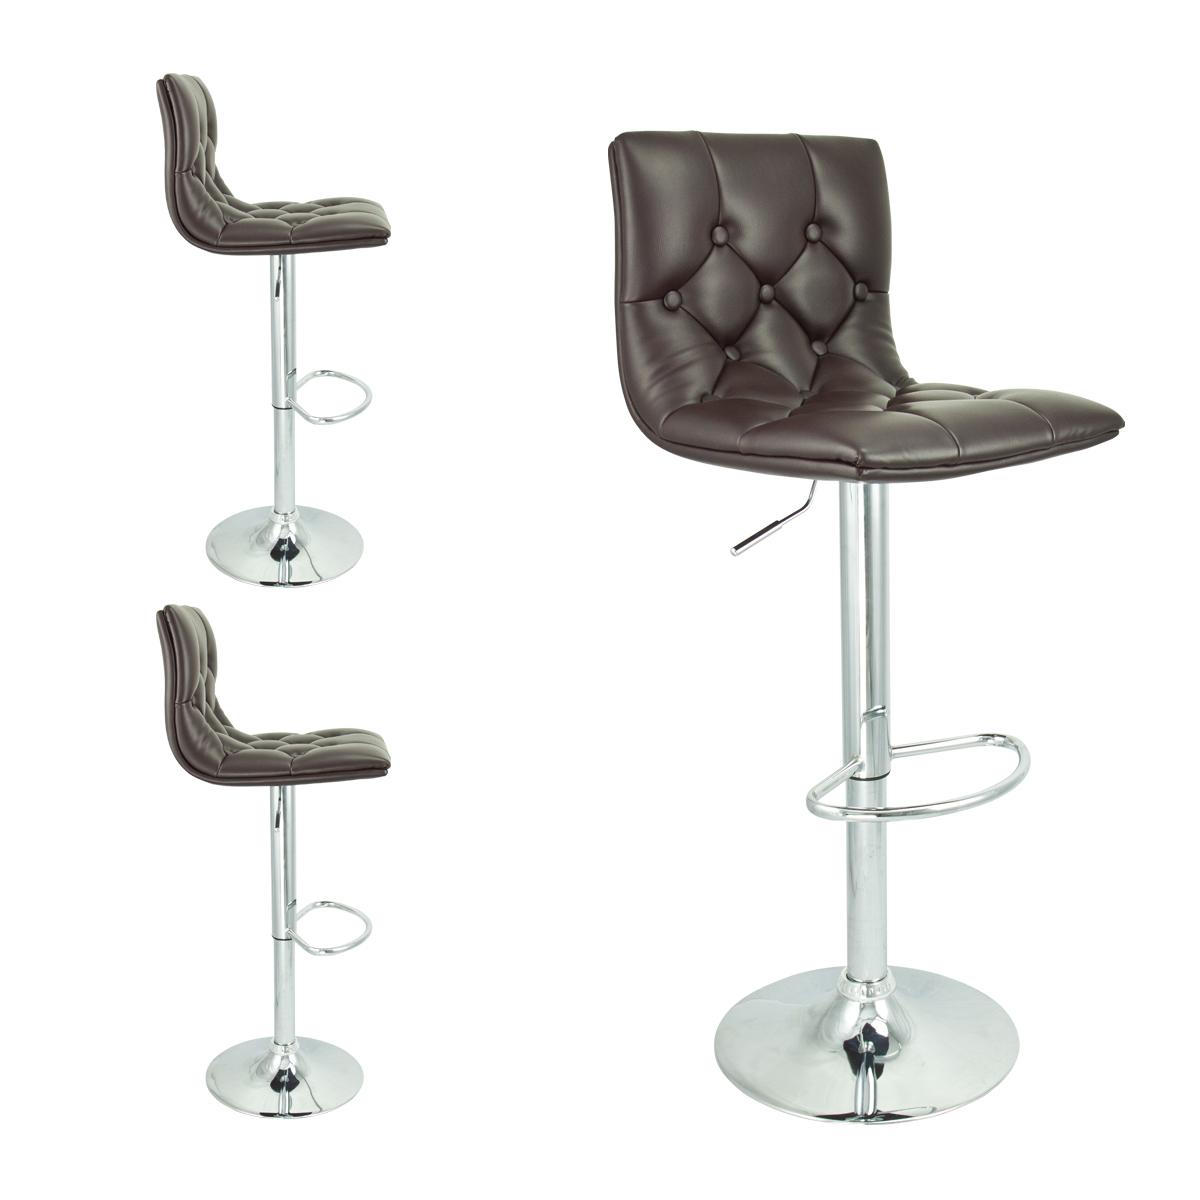 2 Barstools Swivel Seat Brown PU Leather Modern Adjustable  : 39045ac from www.ebay.com size 1200 x 1200 jpeg 293kB